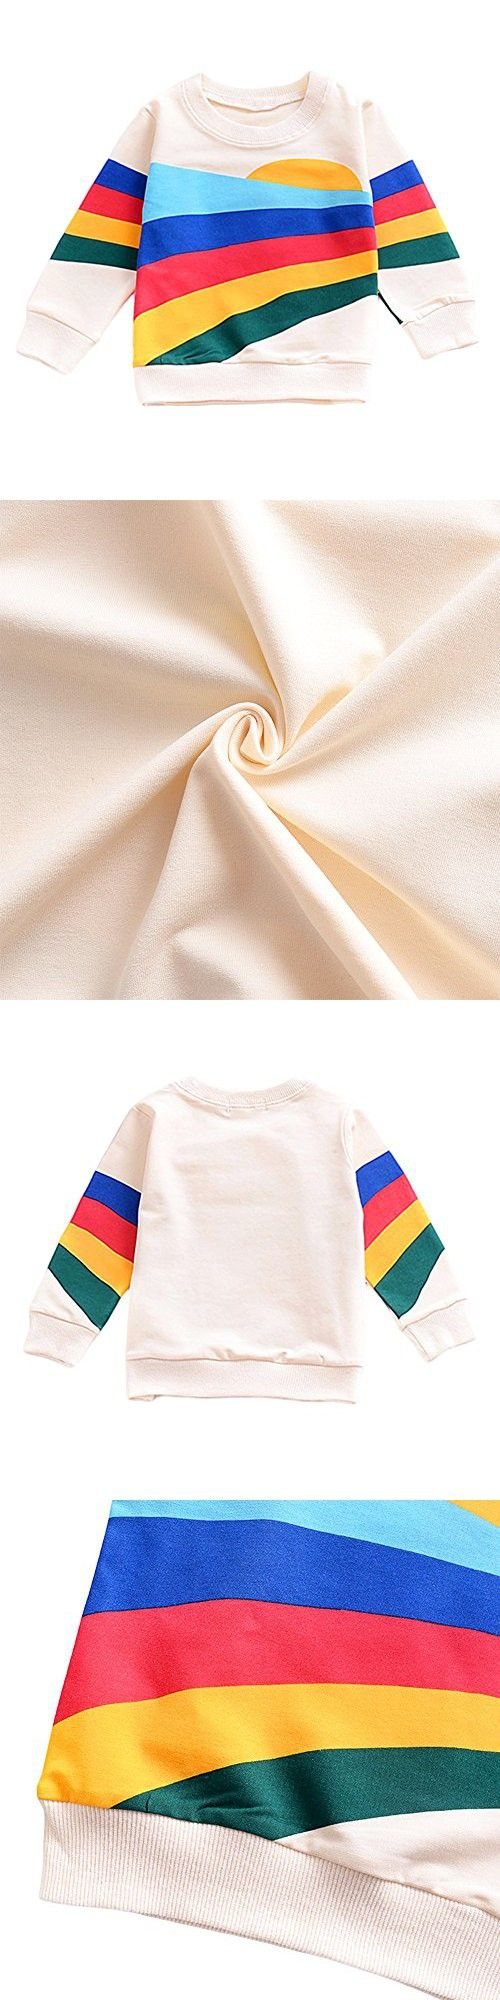 YOHA Baby Girls Autumn Soft Rainbow Top Blouse Long Sleeve Toddler Casual Tops Sunrise,110